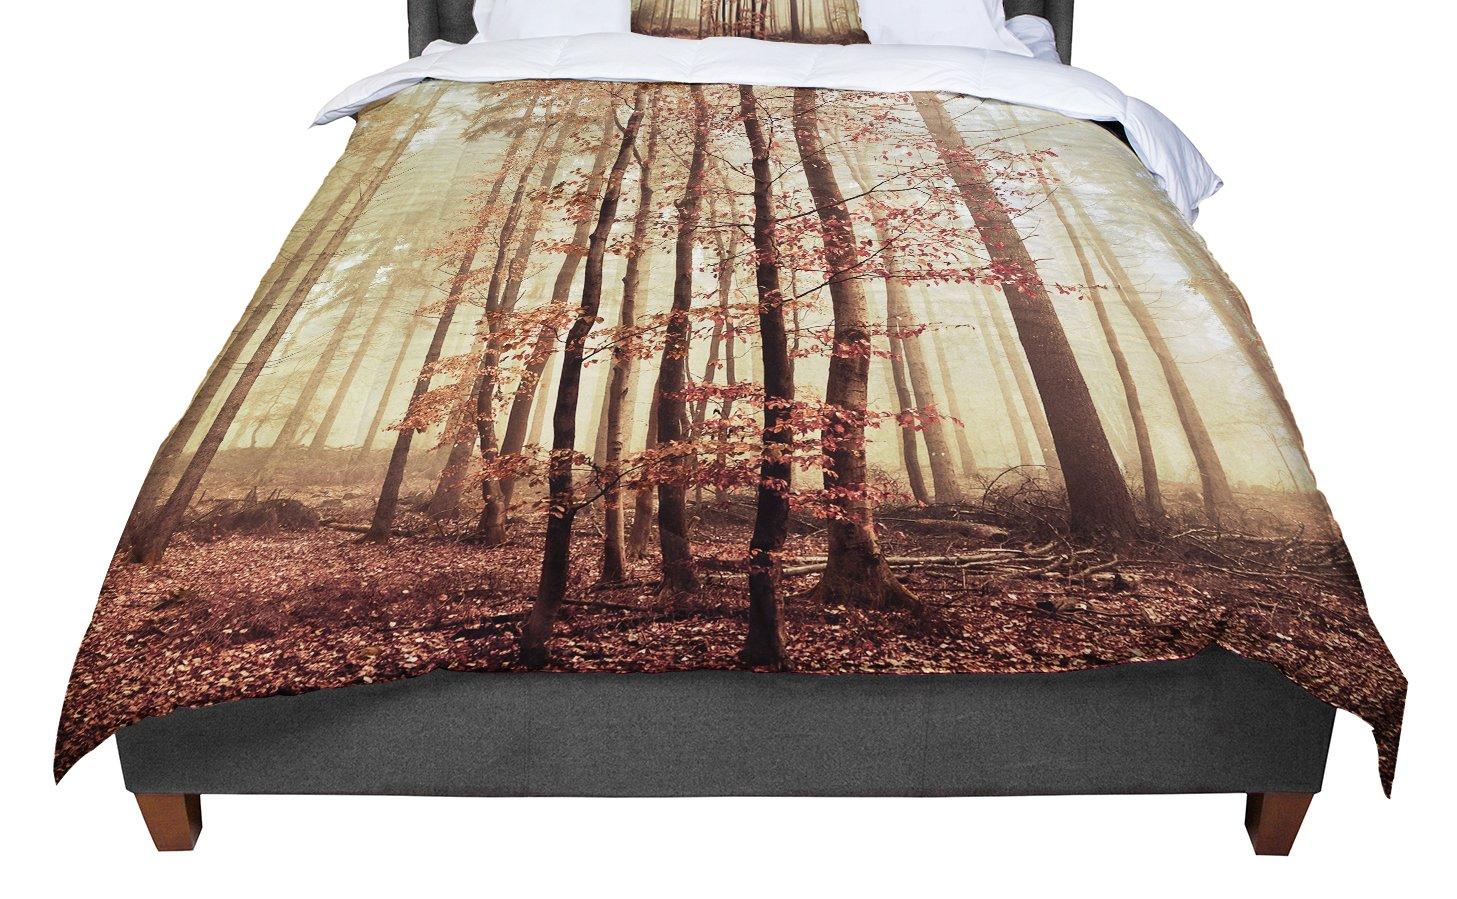 KESS InHouse Iris Lehnhardt Autumn Again Brown King 104 X 88 Cal King Comforter